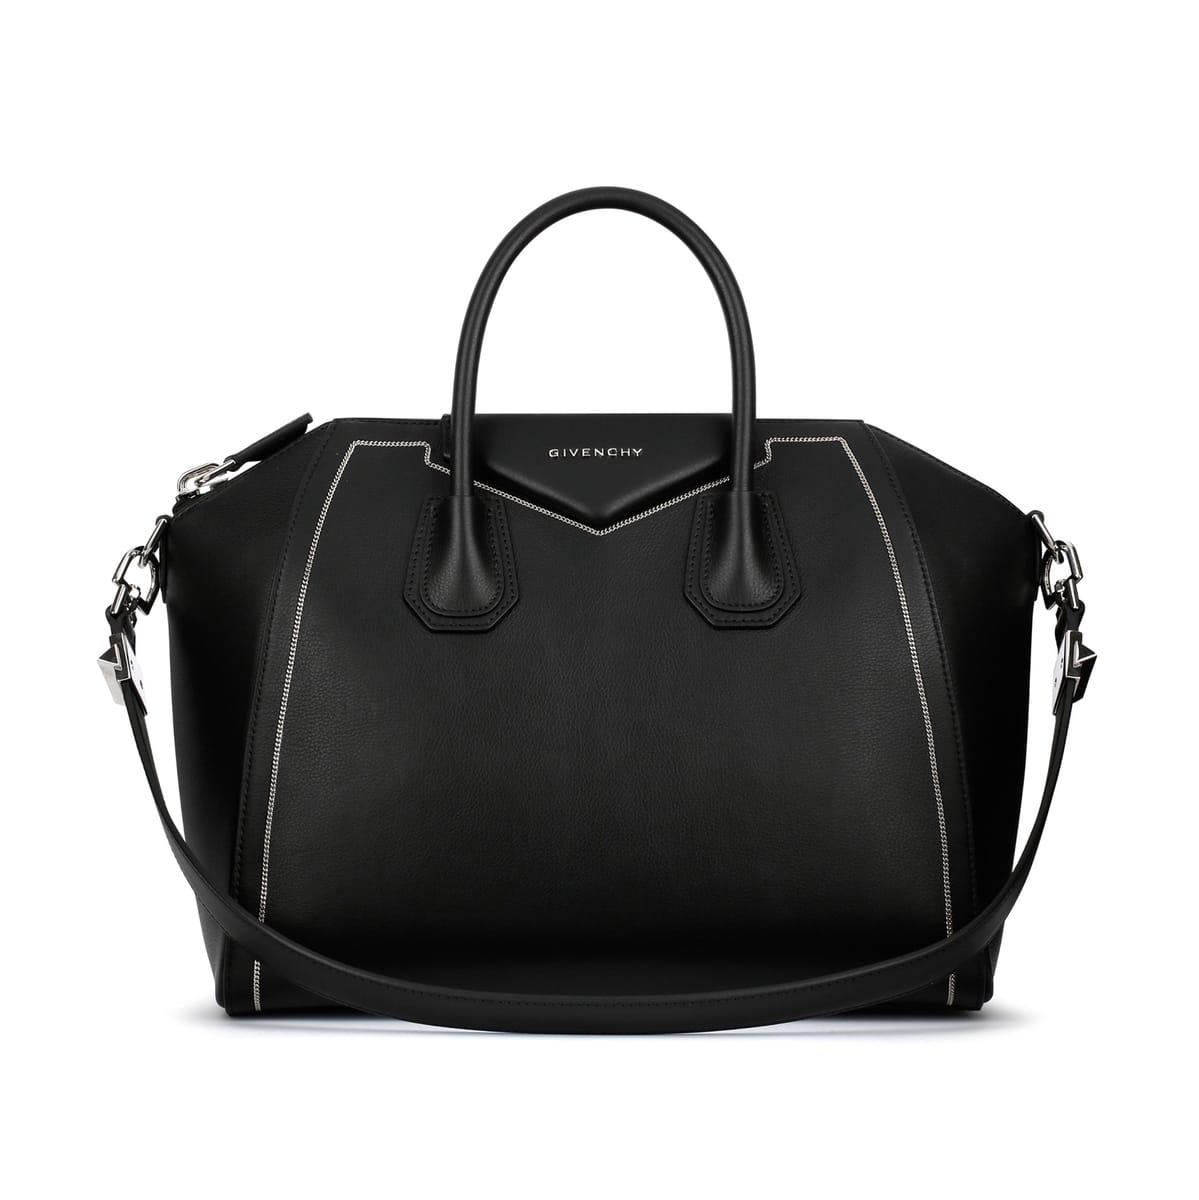 givenchy spring summer 2016 bag collection spotted fashion. Black Bedroom Furniture Sets. Home Design Ideas